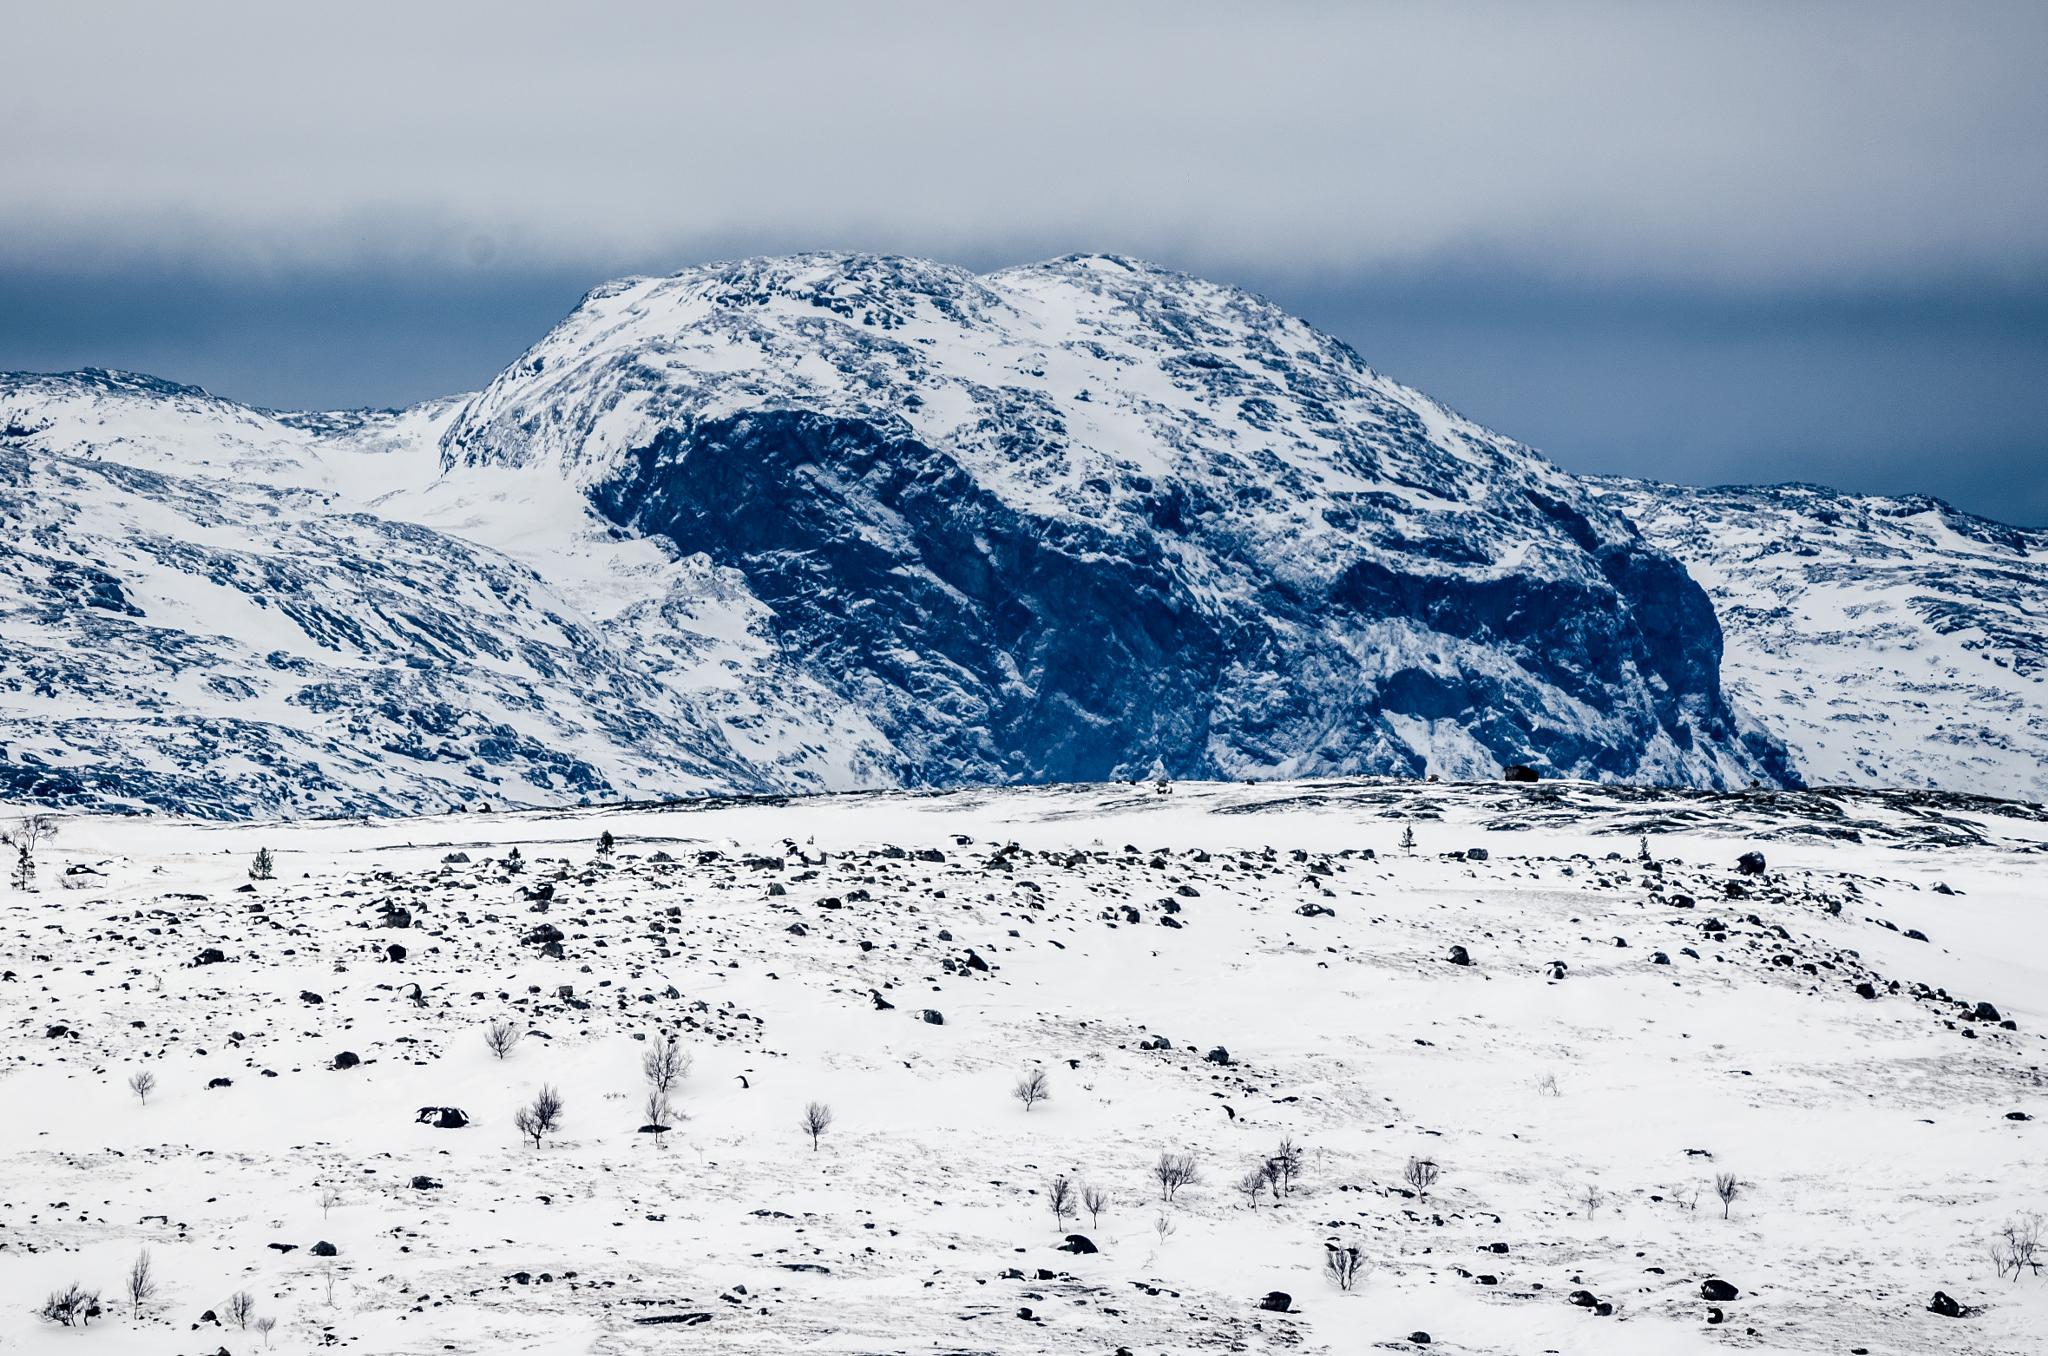 Norwegian tundra by Roy Haakon Friskilae